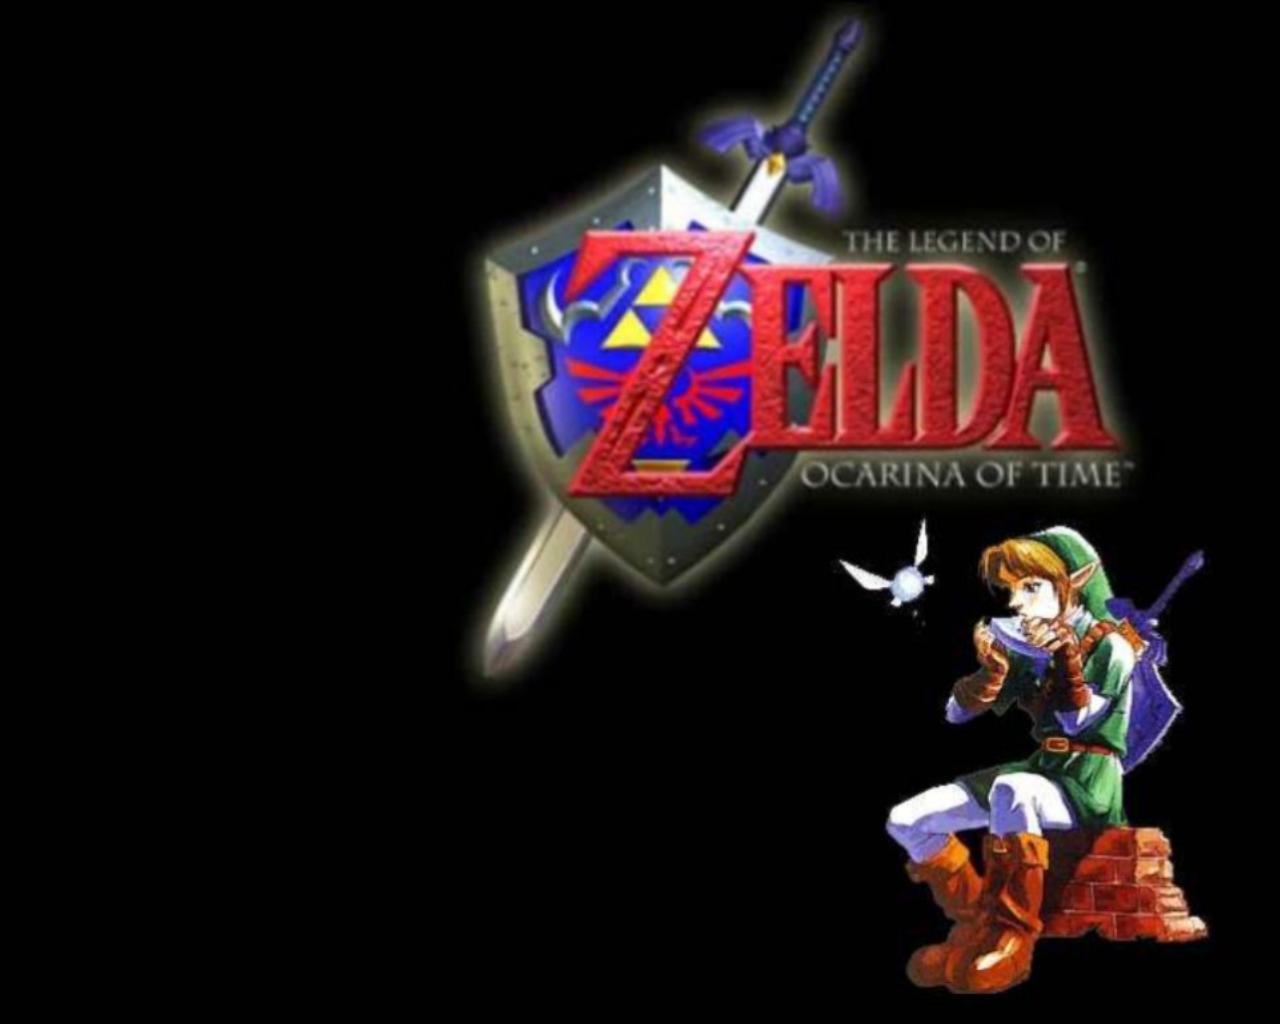 Imágenes de The Legend of Zelda: Ocarina of Time de 3DS  y N64 [Comparativa]